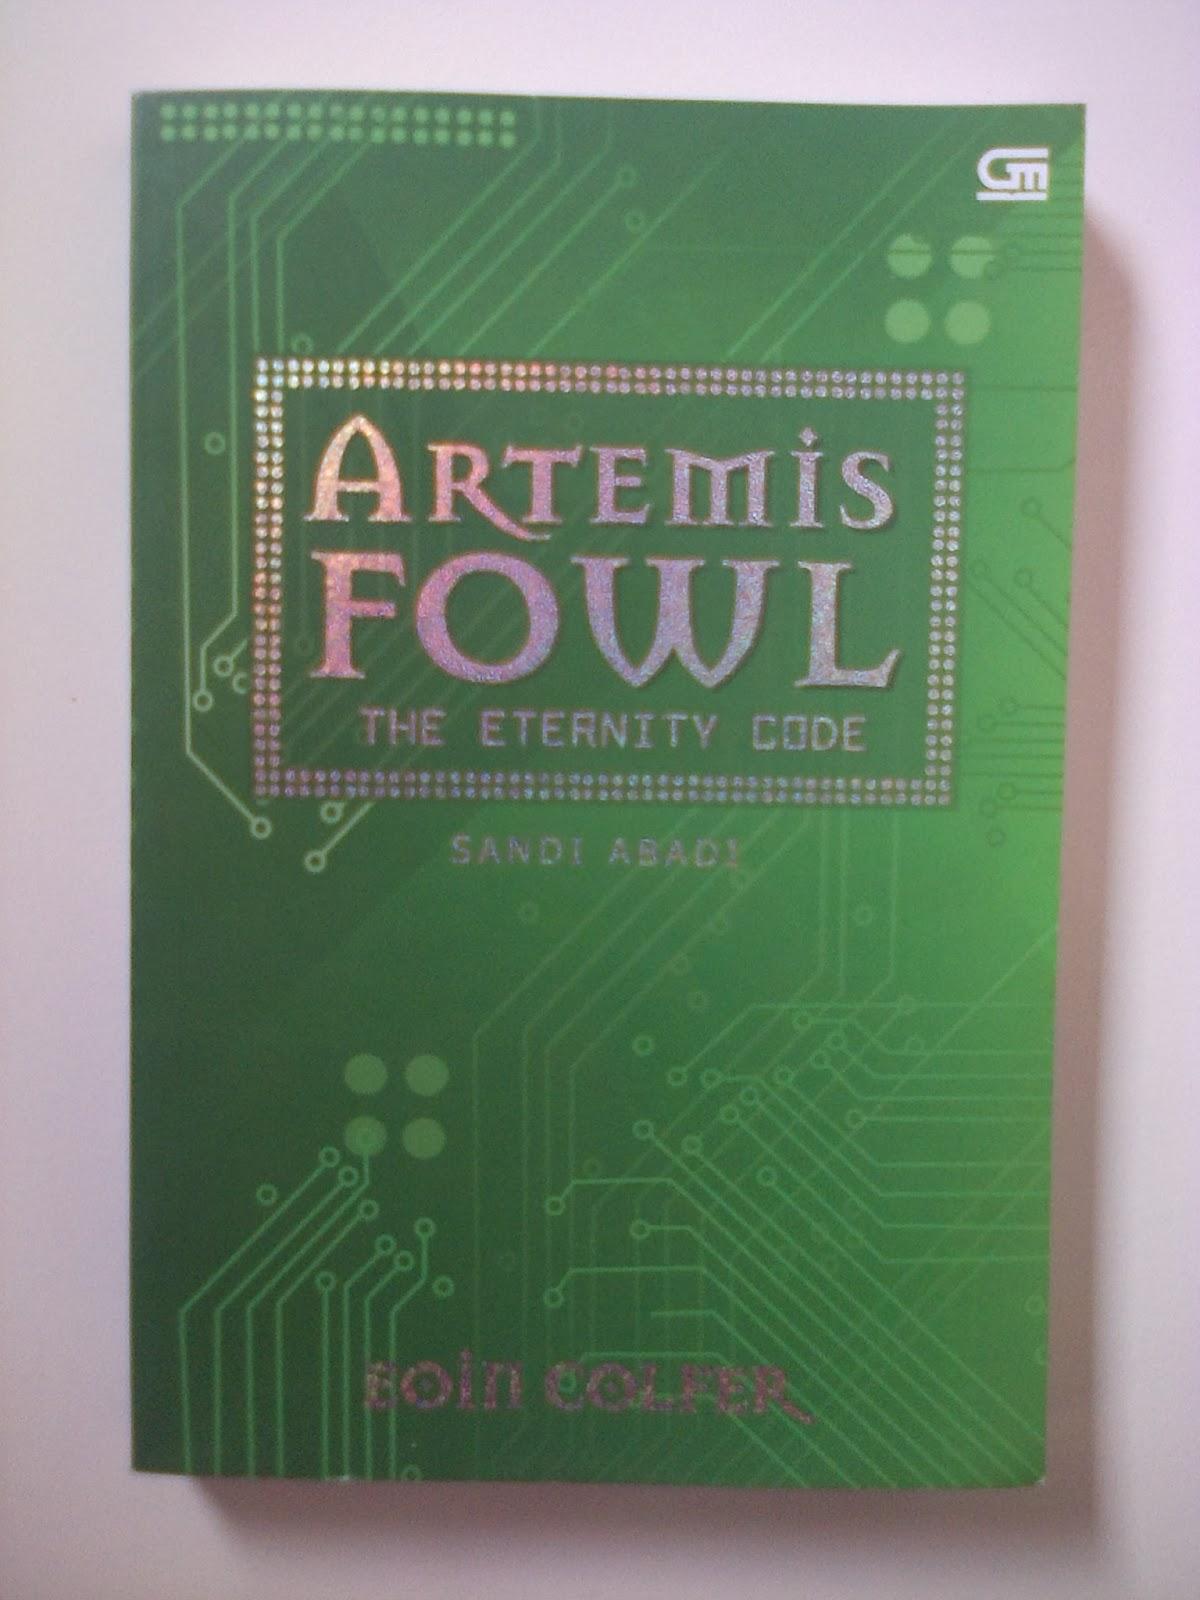 Jual Novel: Artemis Fowl: The Eternity Code (Sandi Abadi)